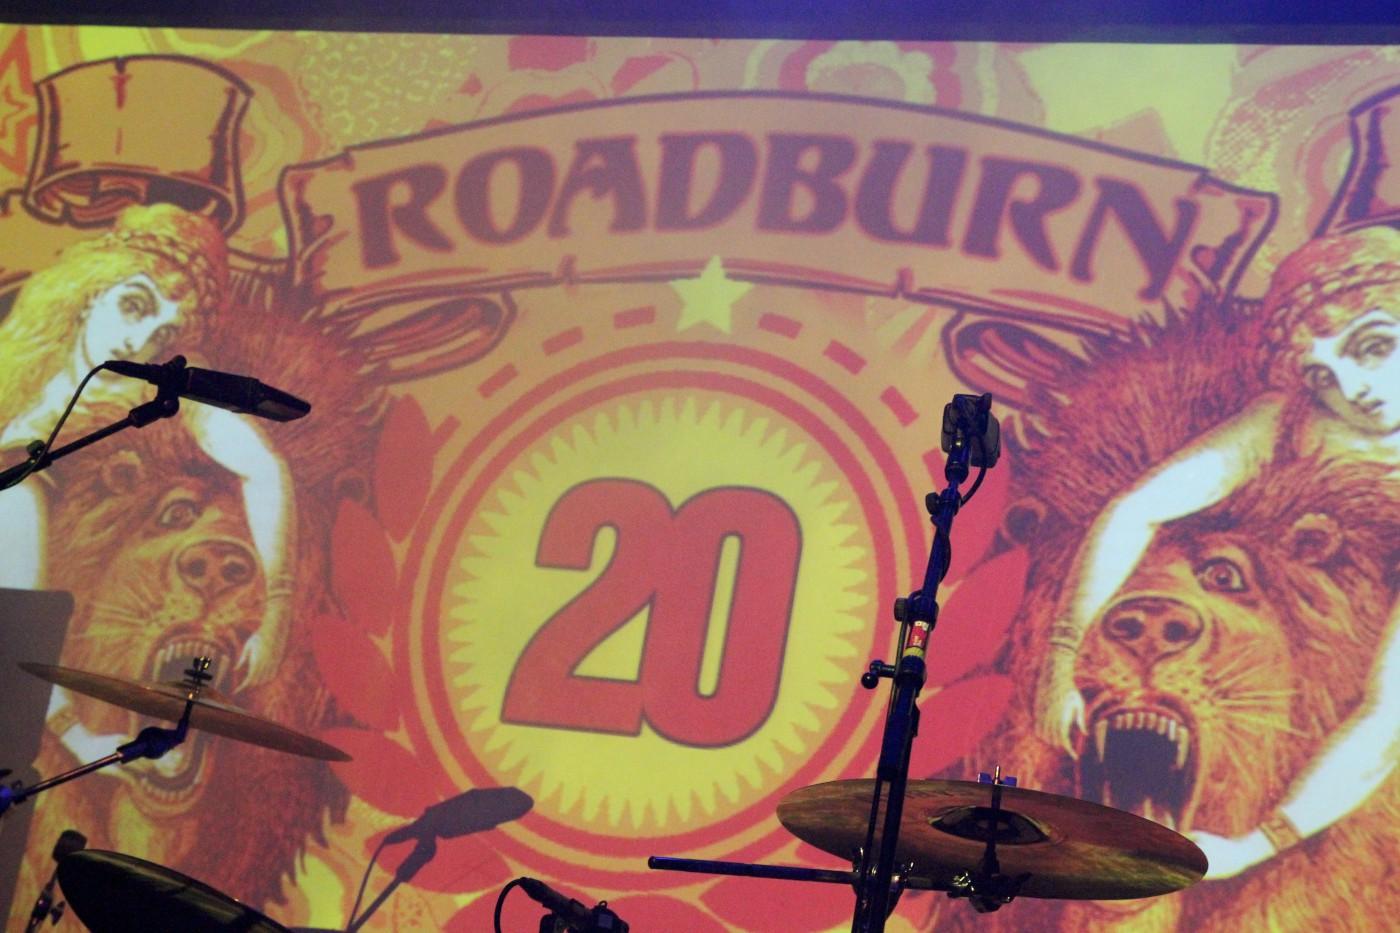 Roadburn 2015 banner. (Photo by JJ Koczan)